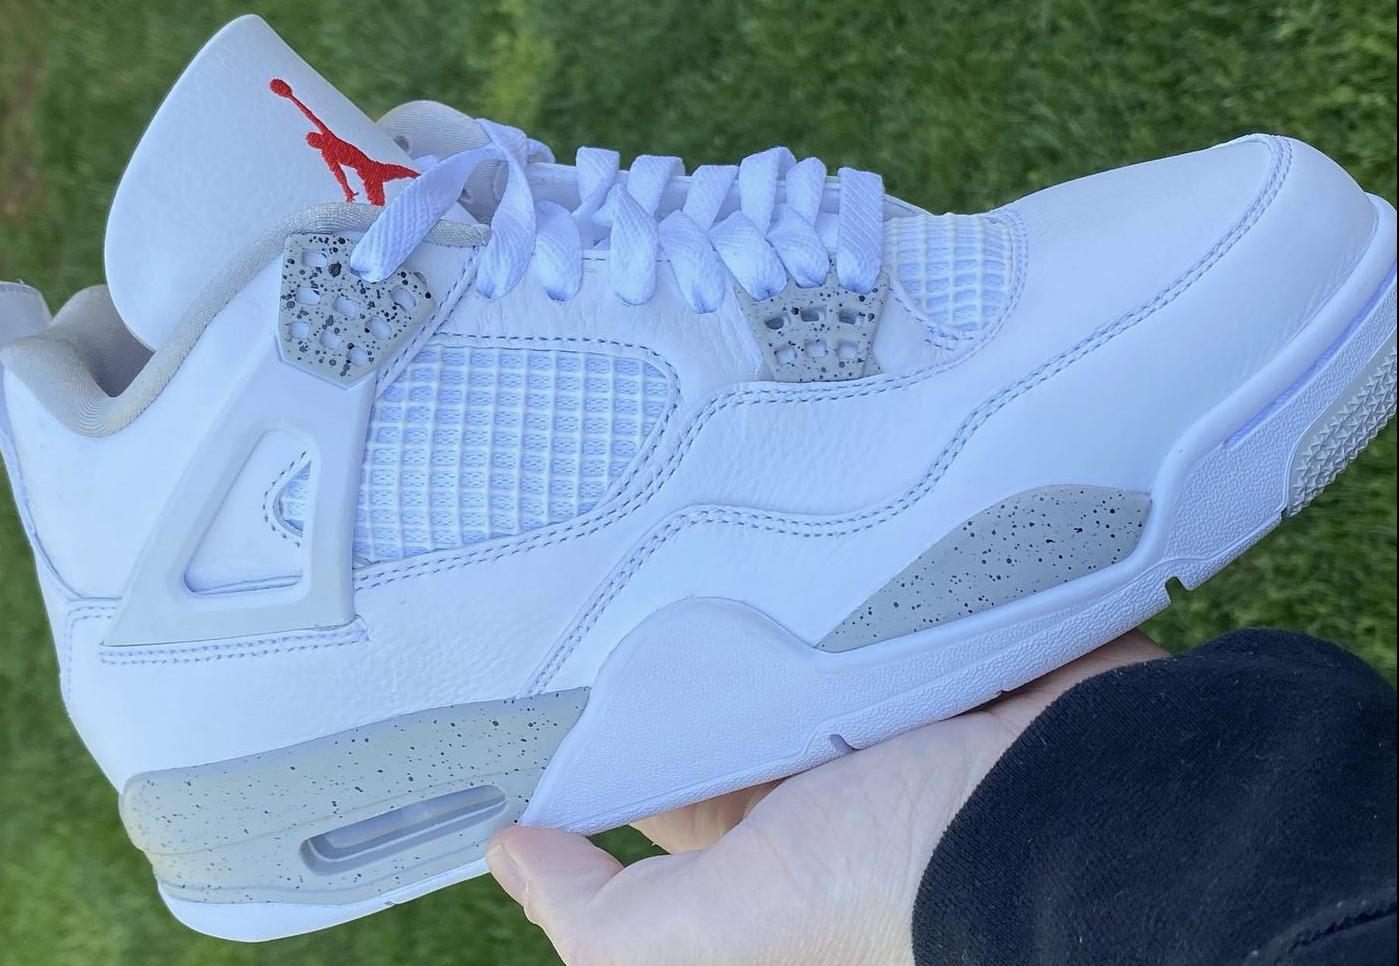 Air Jordan 4 White Oreo Dropping in June 1399x966